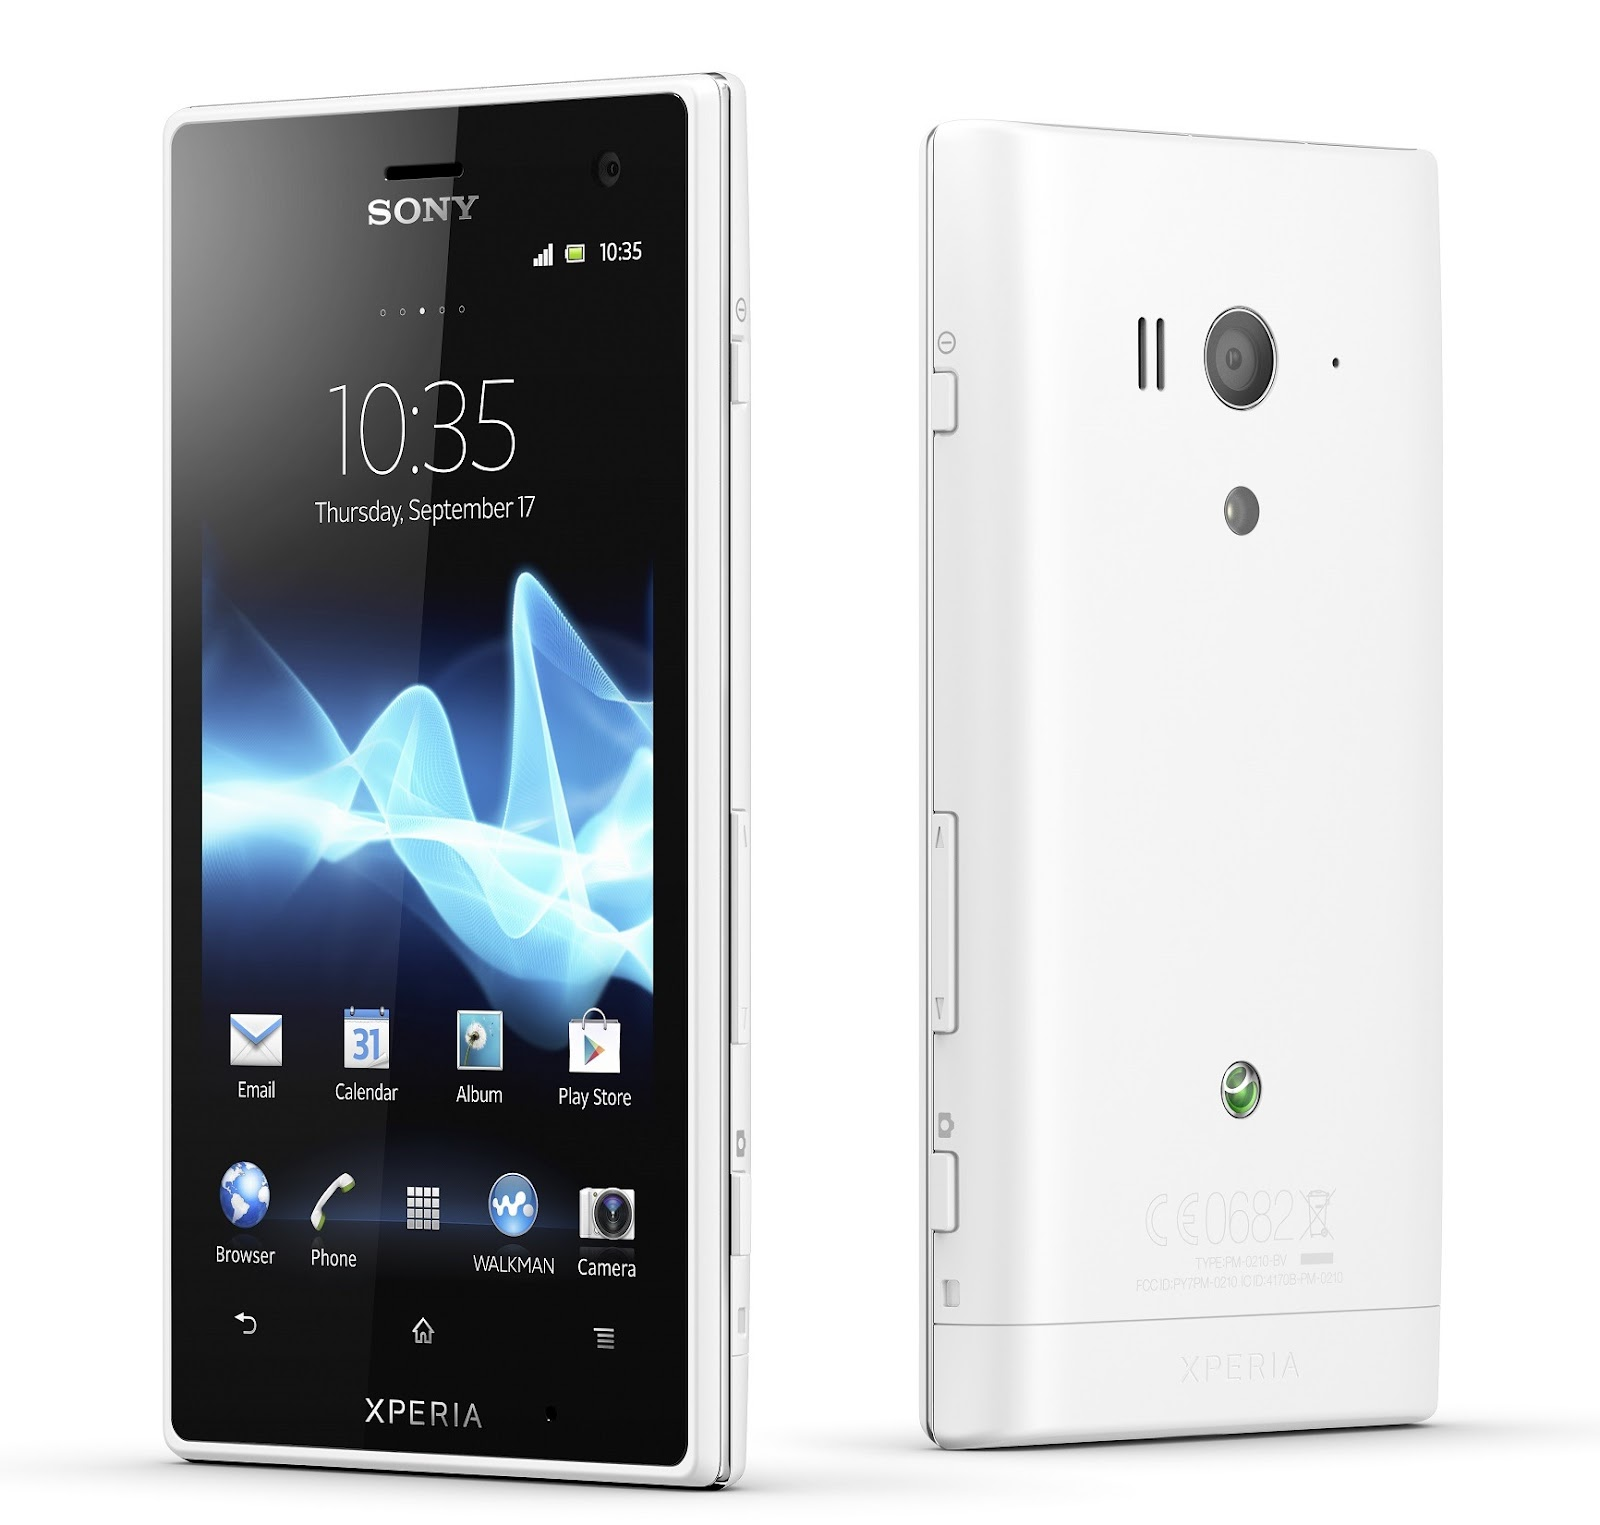 Februari 2013 Samsung Galaxy Chat B5330 4gb Putih Sony Xperia Acro S Review